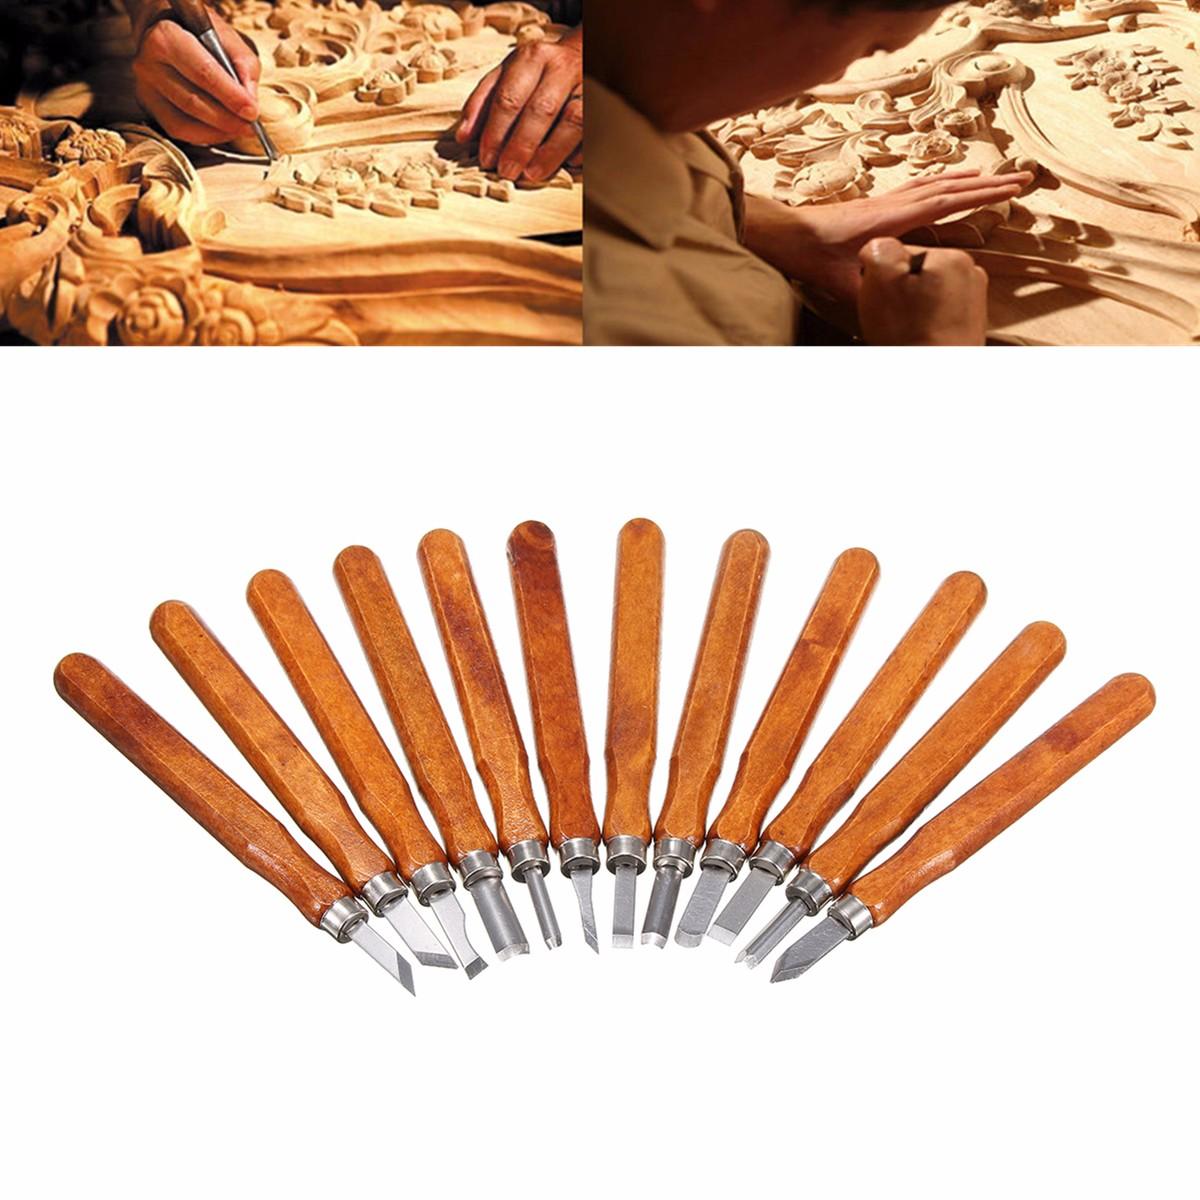 12Pcs Wood Carving Woodworking Hand Chisel Set Professional Lathe Gouges Tools | Alex NLD